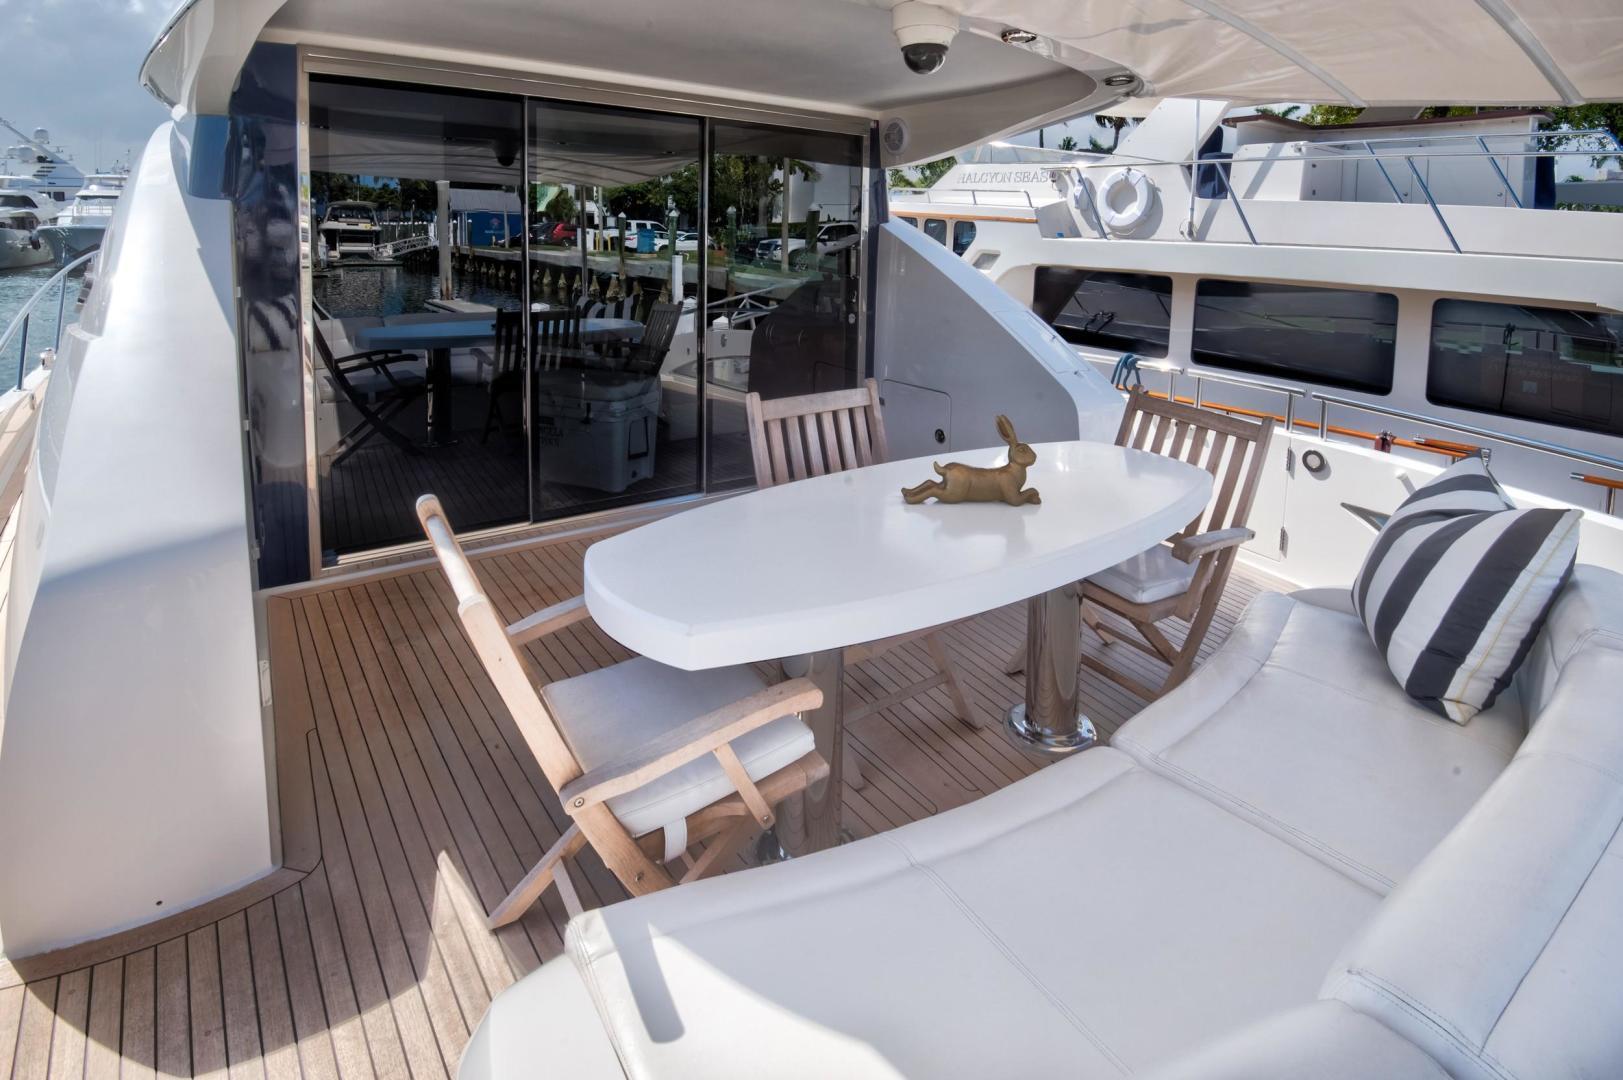 75 Lazzara Aft Deck Seating